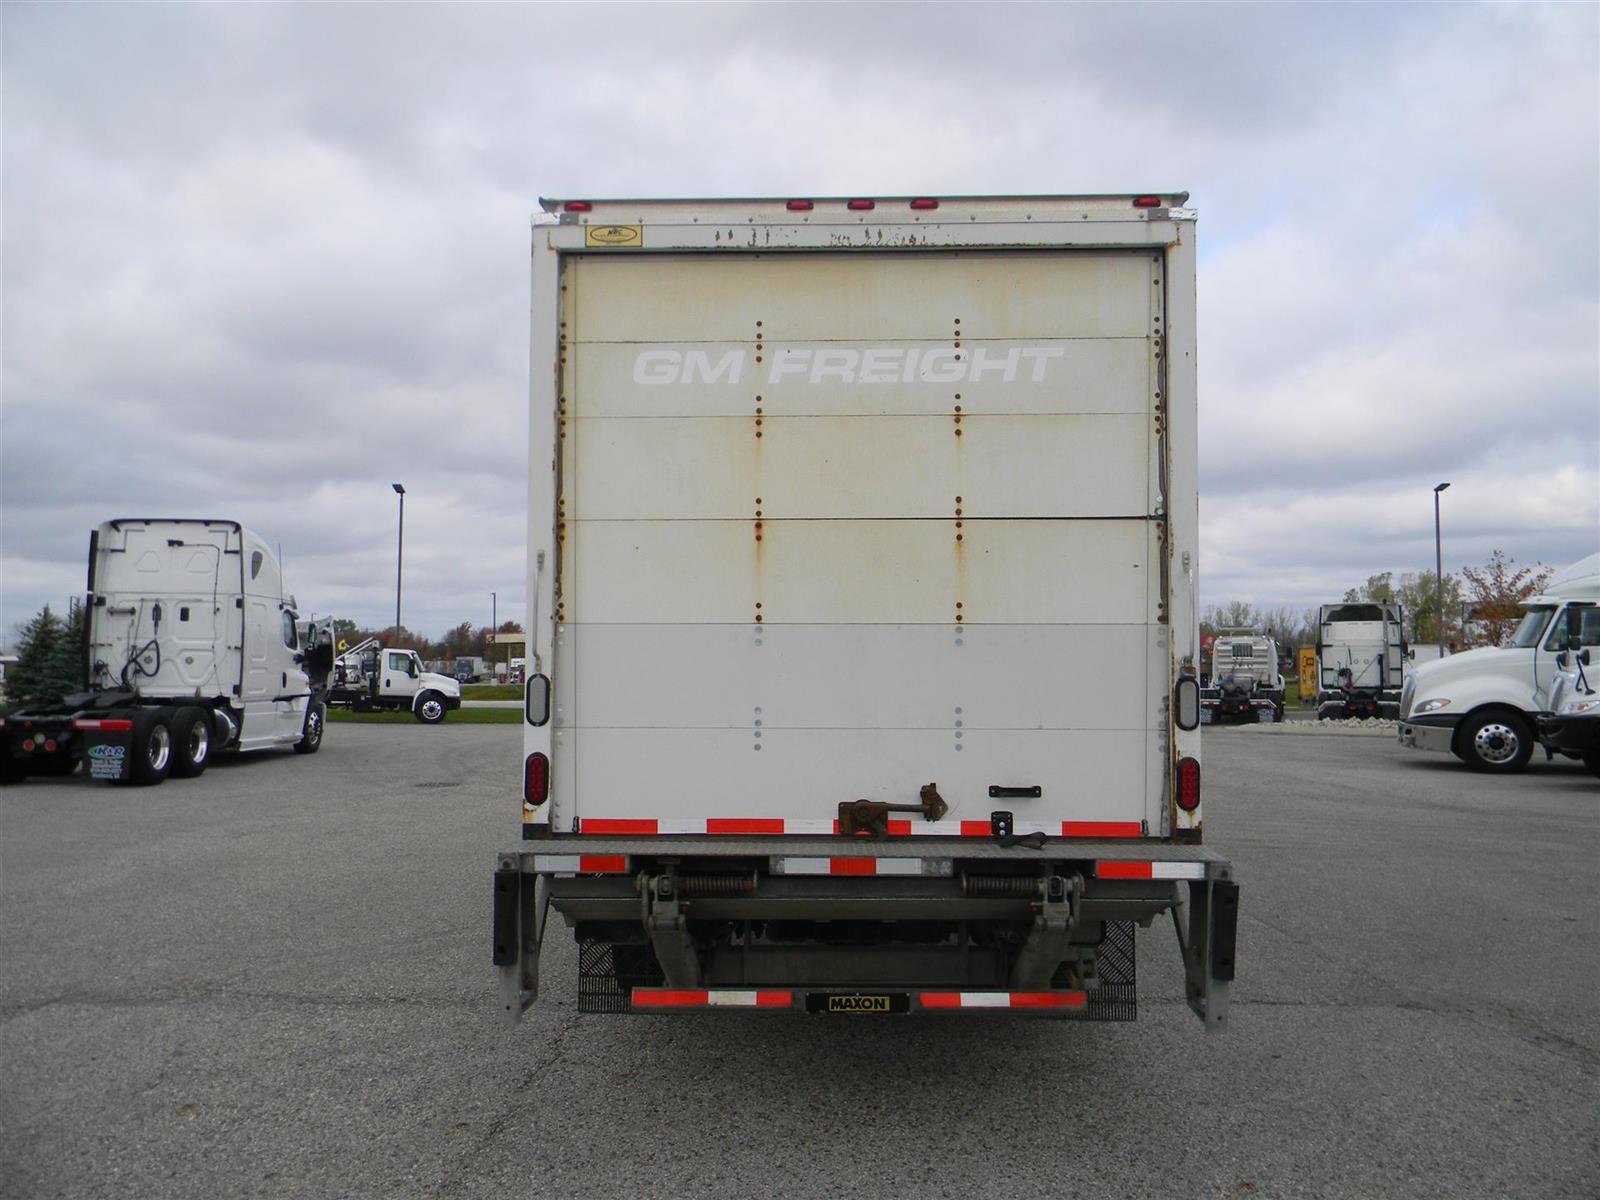 2014 Ford F-550 Regular Cab DRW 4x2, Dry Freight #119756 - photo 1